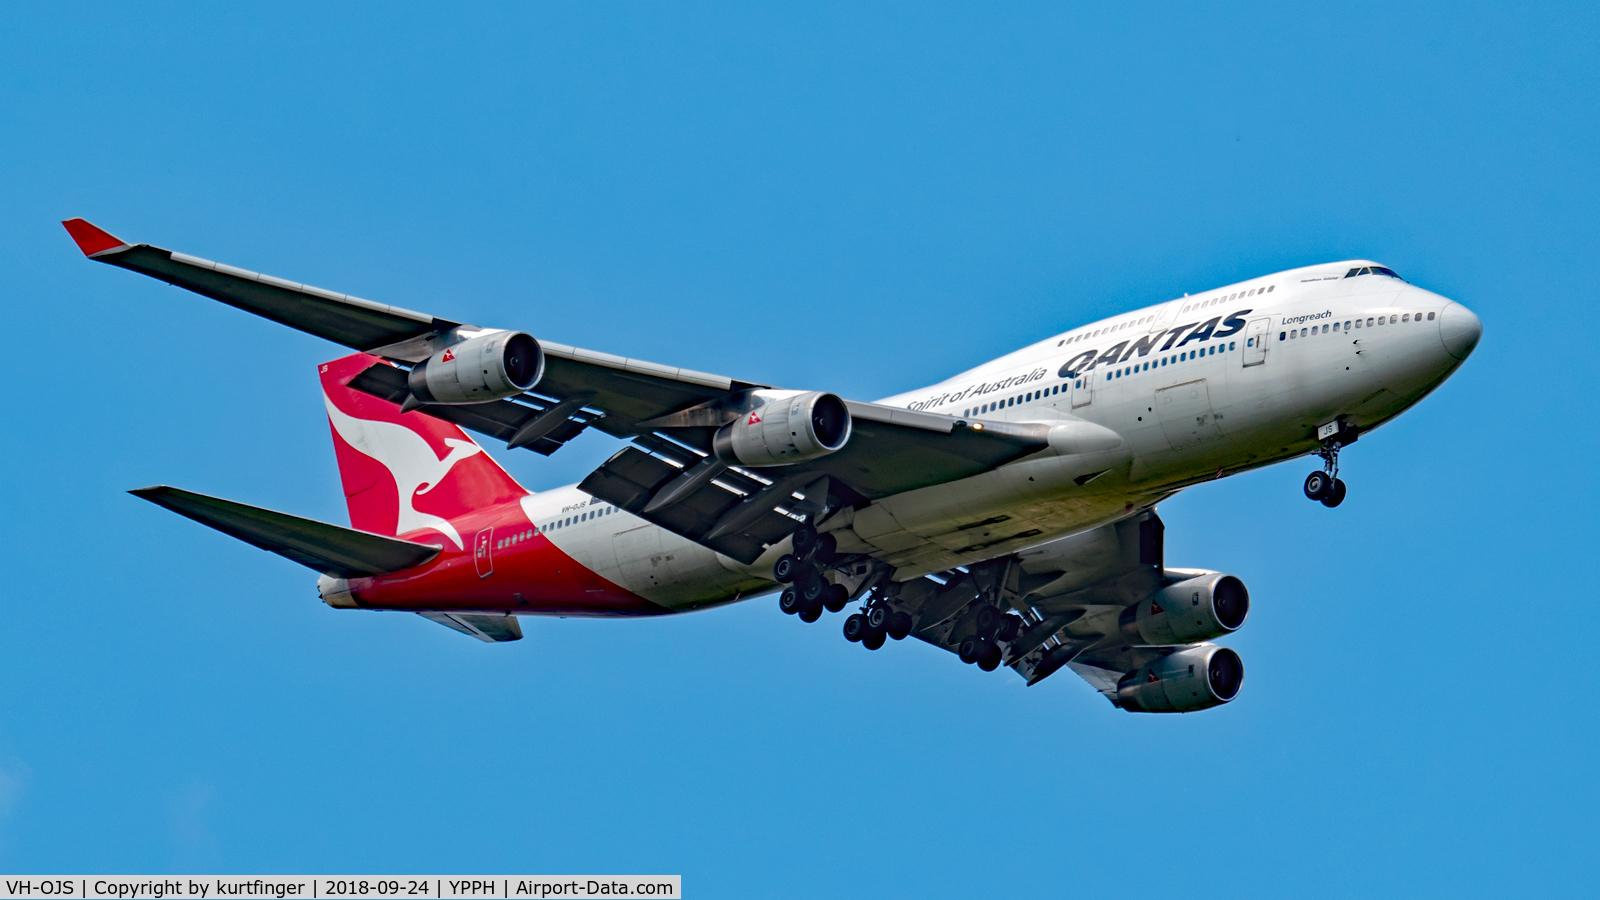 VH-OJS, 1999 Boeing 747-438 C/N 25564, Boeing 747-400. Qantas VH-OJS final runway 21 YPPH. Taken at West Parade, South Guildford 24/09/18.